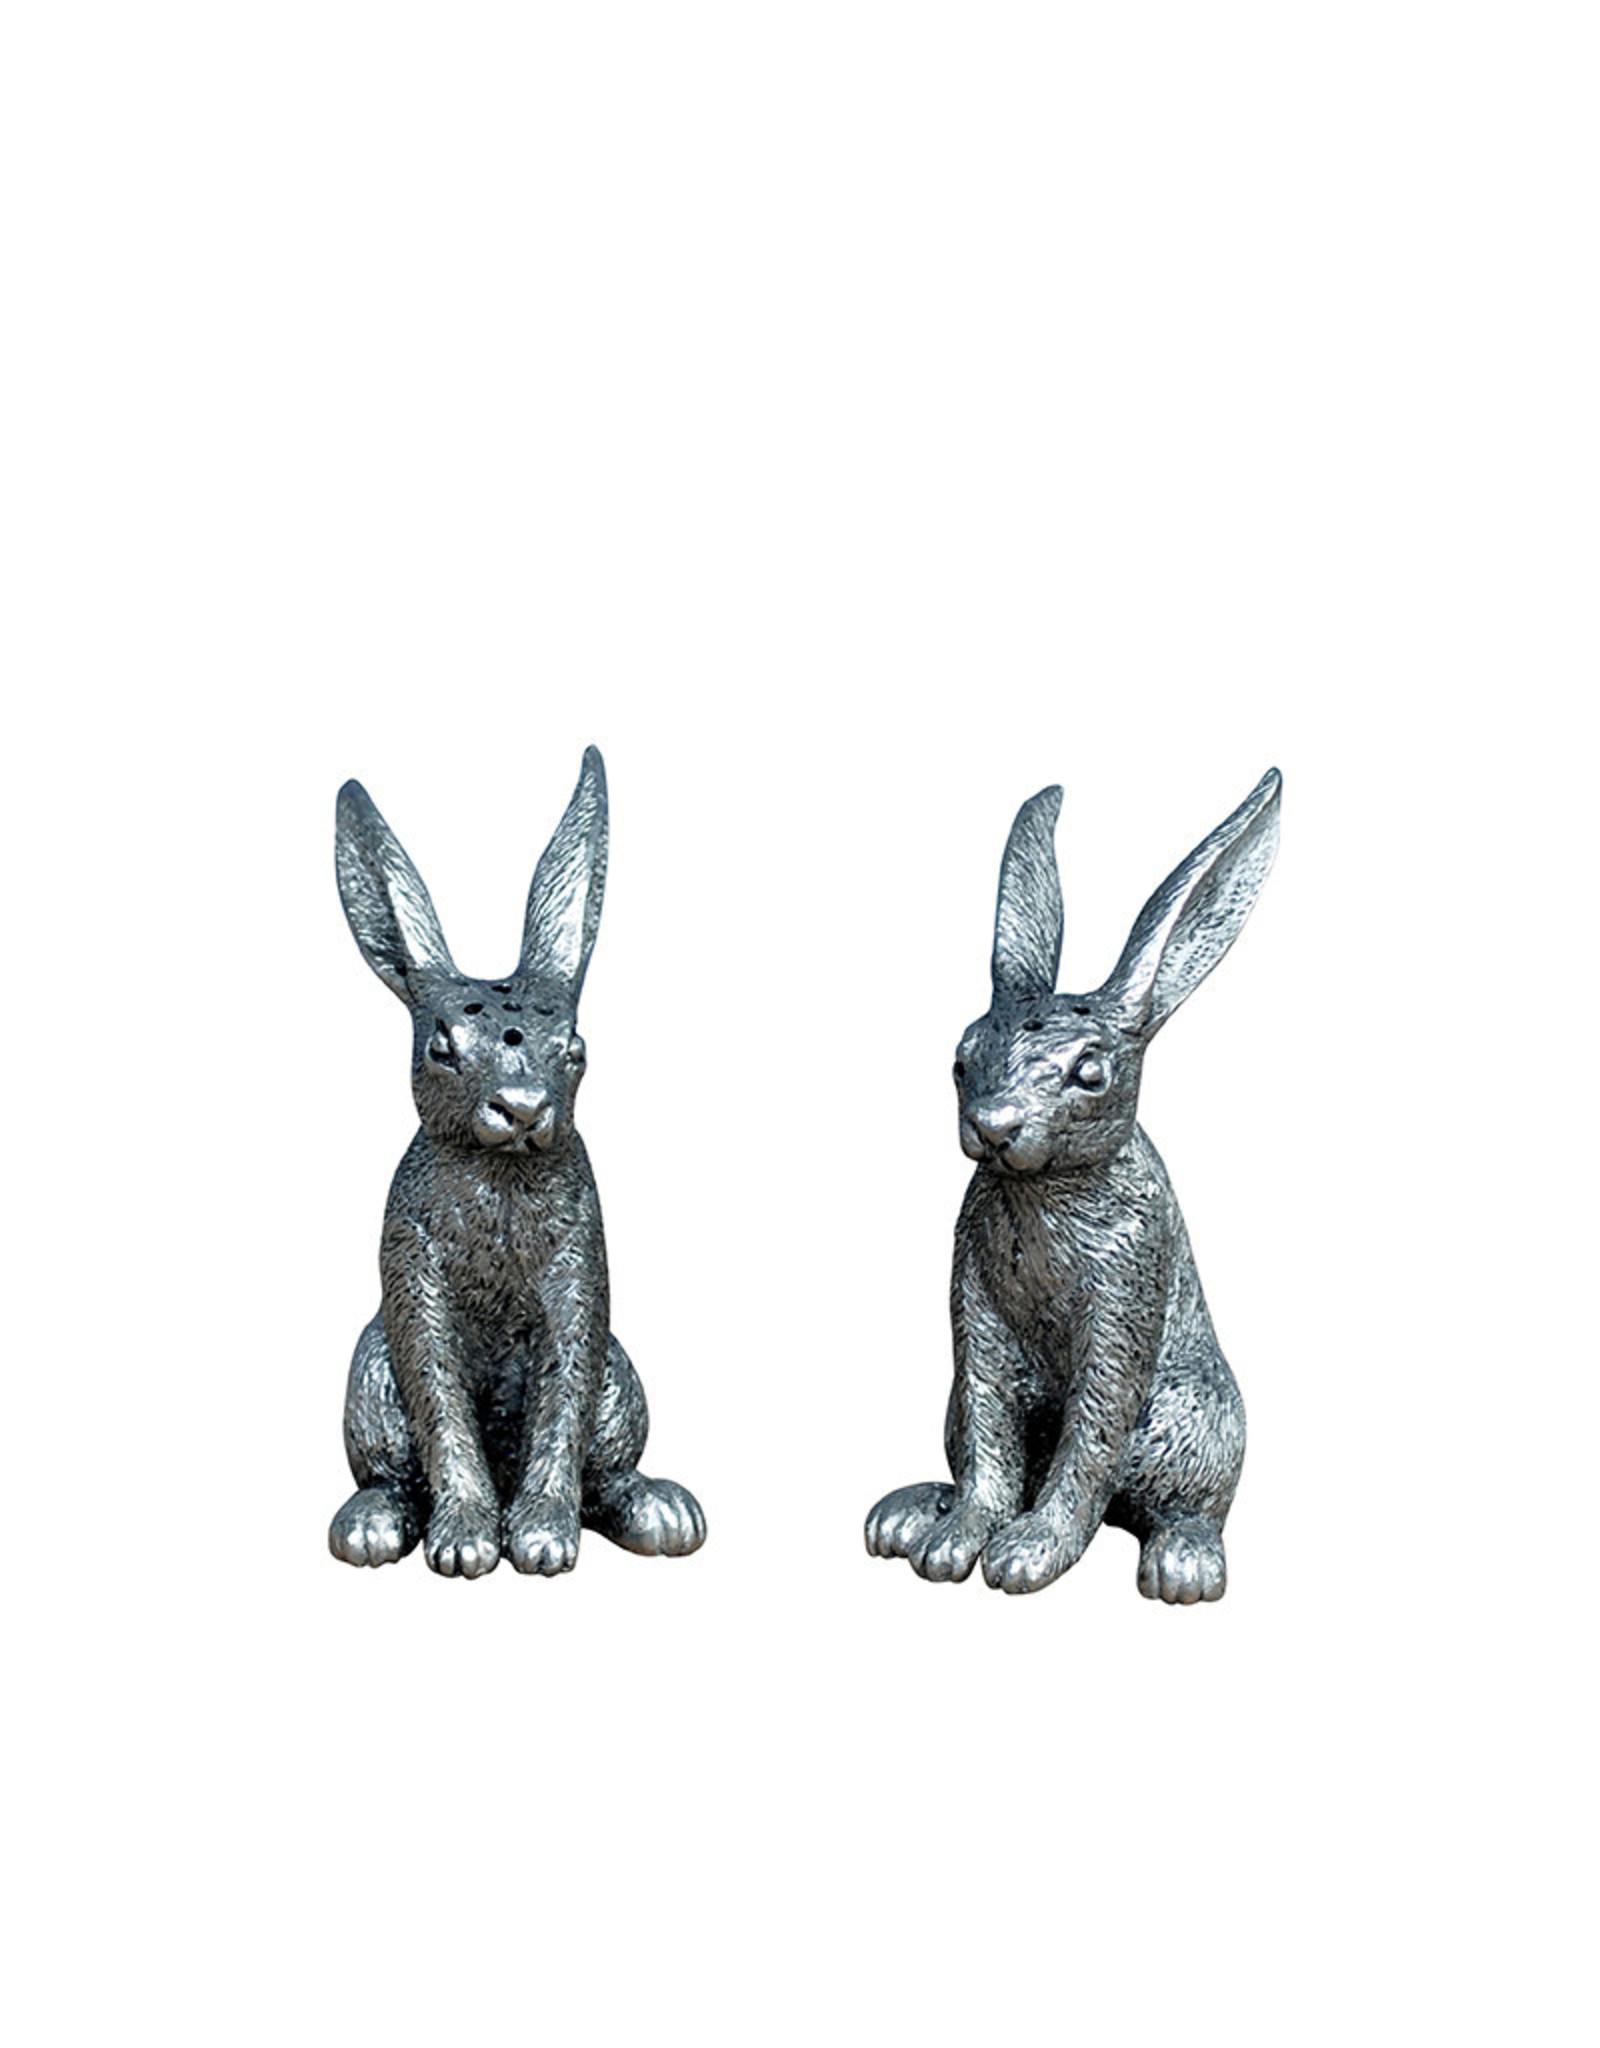 Rabbit pair salt and pepper shaker set